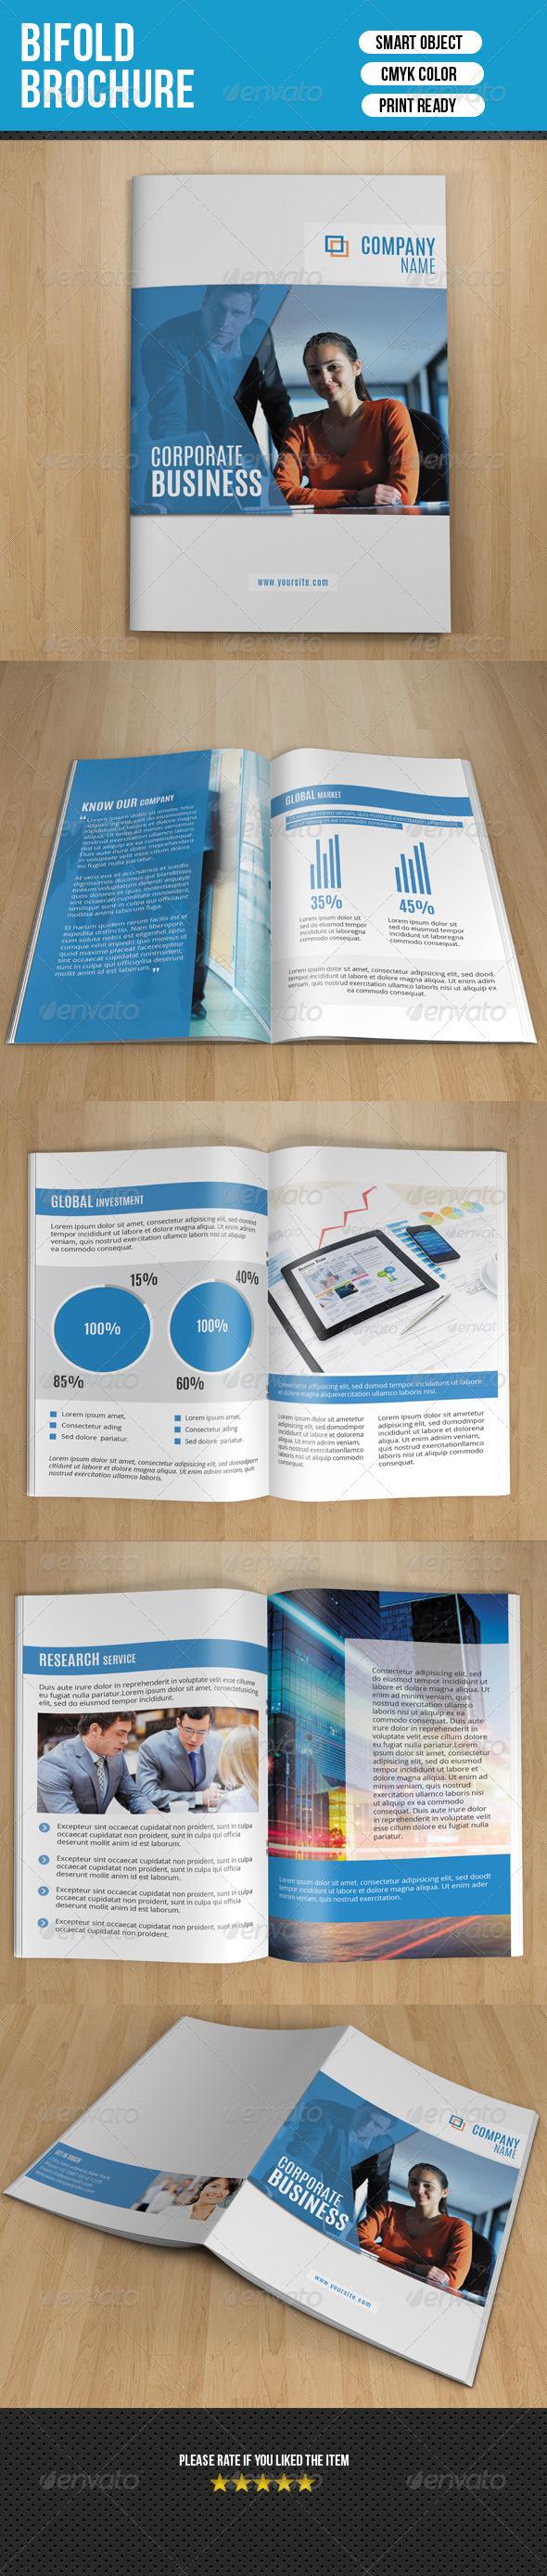 GraphicRiver Fresh Business Bifold Brochure-V70 8101373